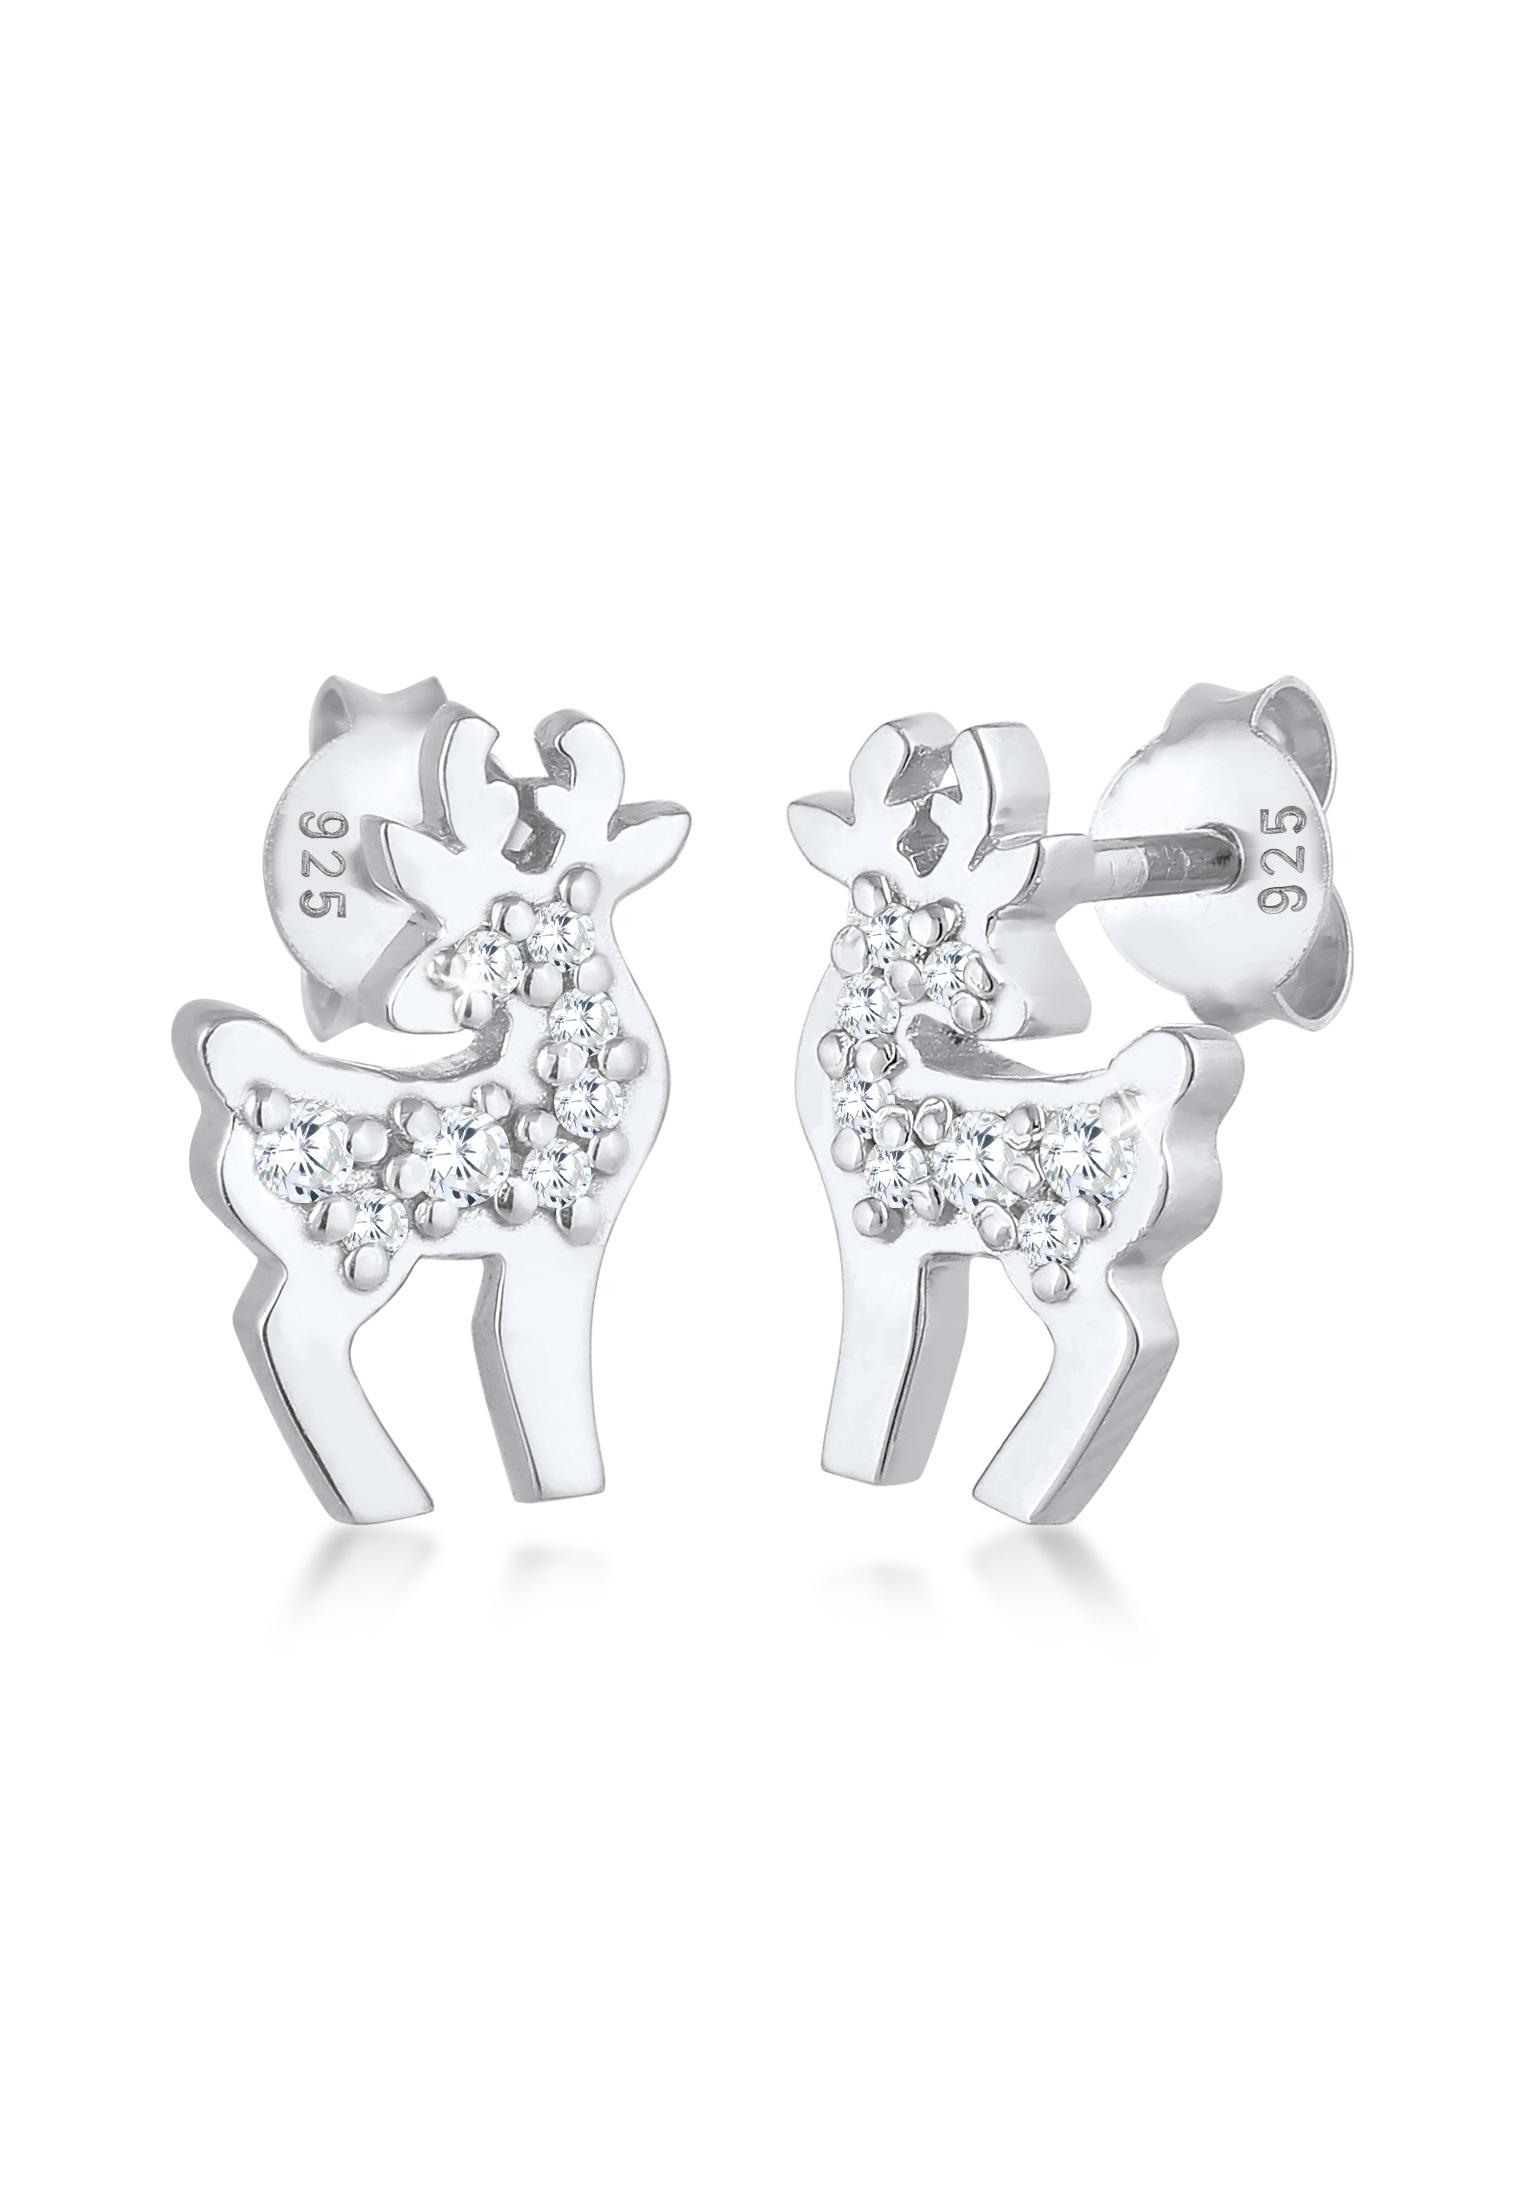 Ohrstecker Rentier | Zirkonia (weiß) | 925er Sterling Silber